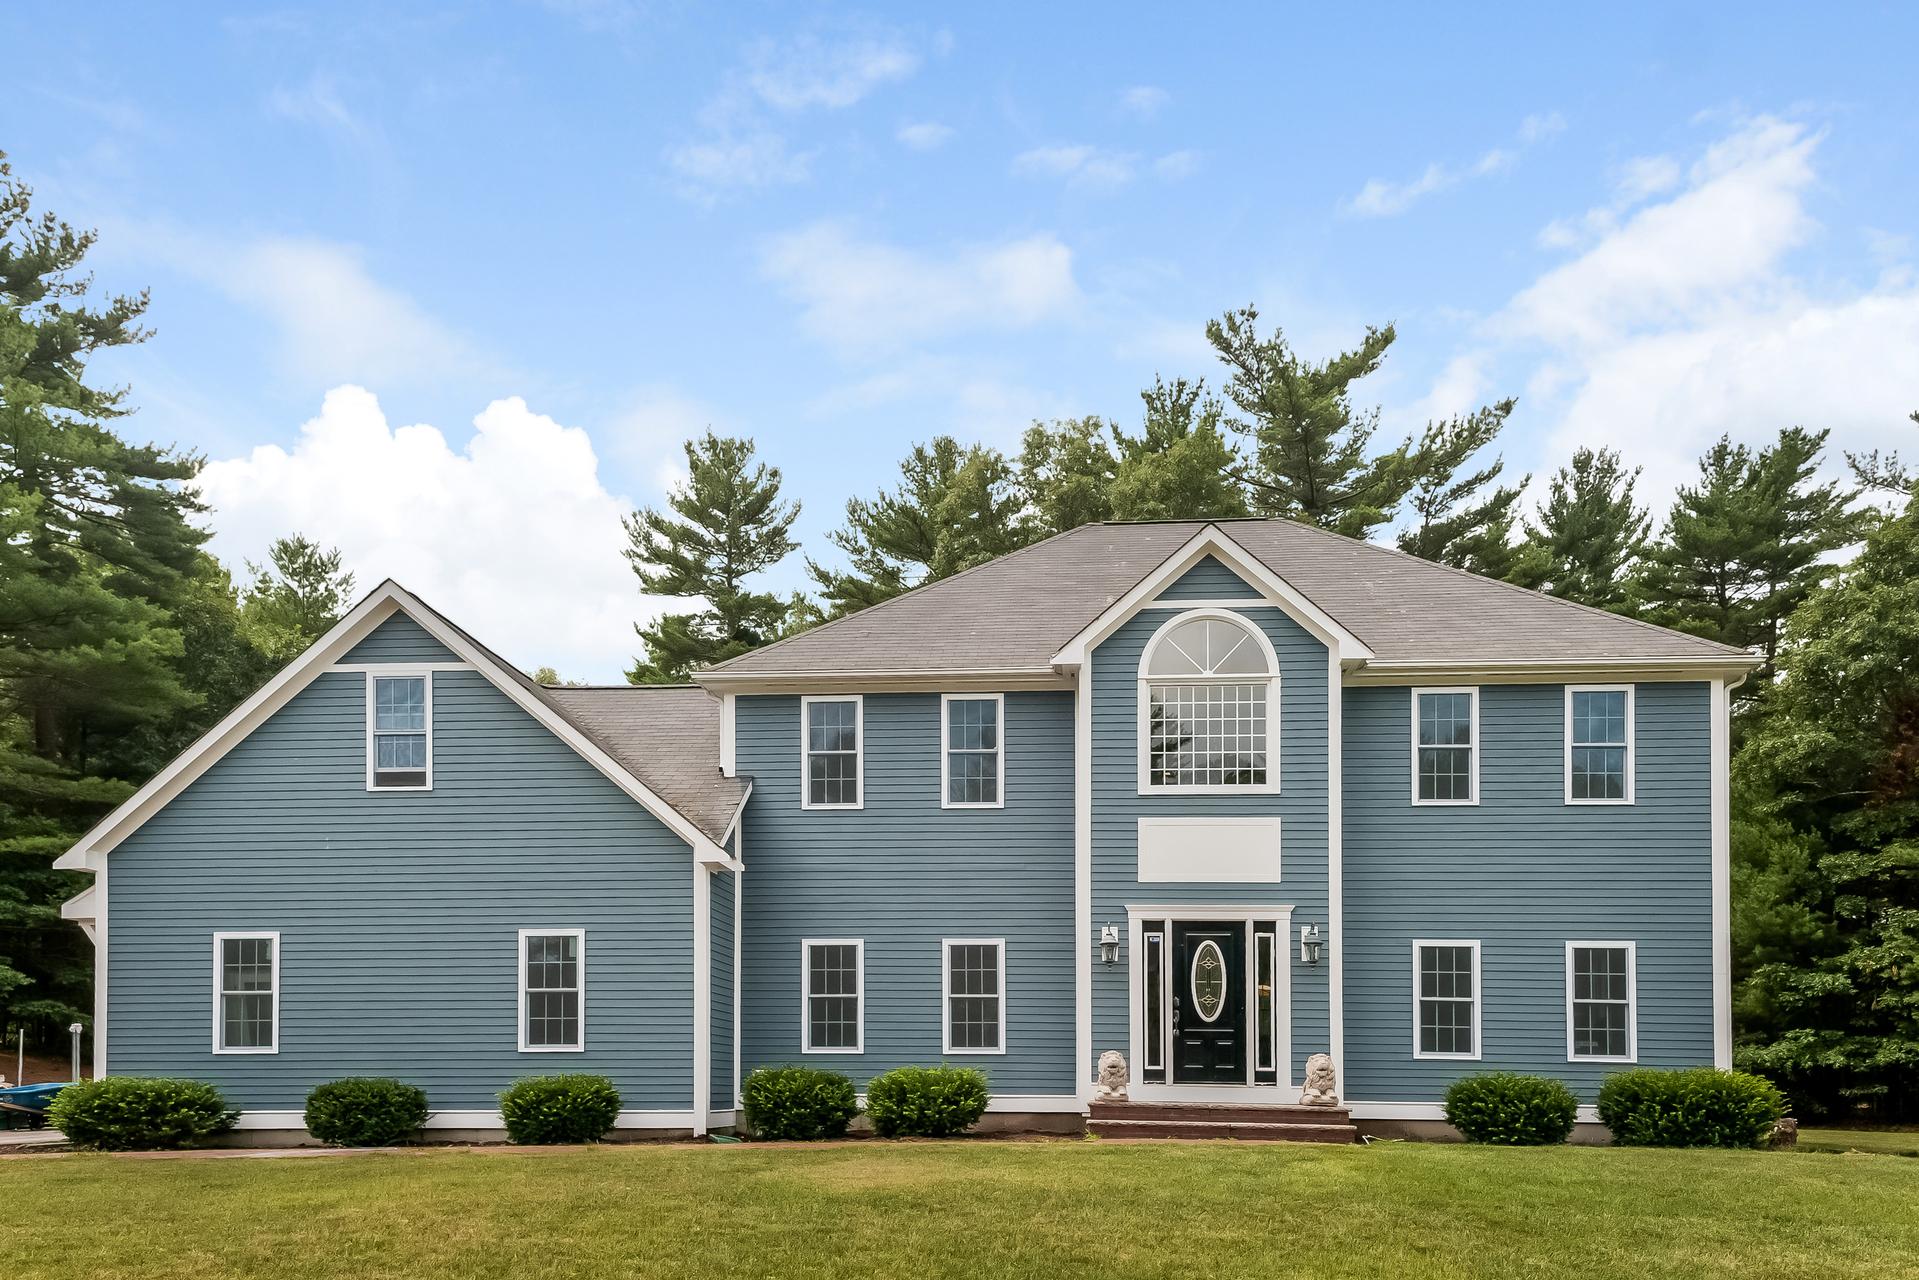 85 High Pines Drive, Kingston, Massachusetts 02364